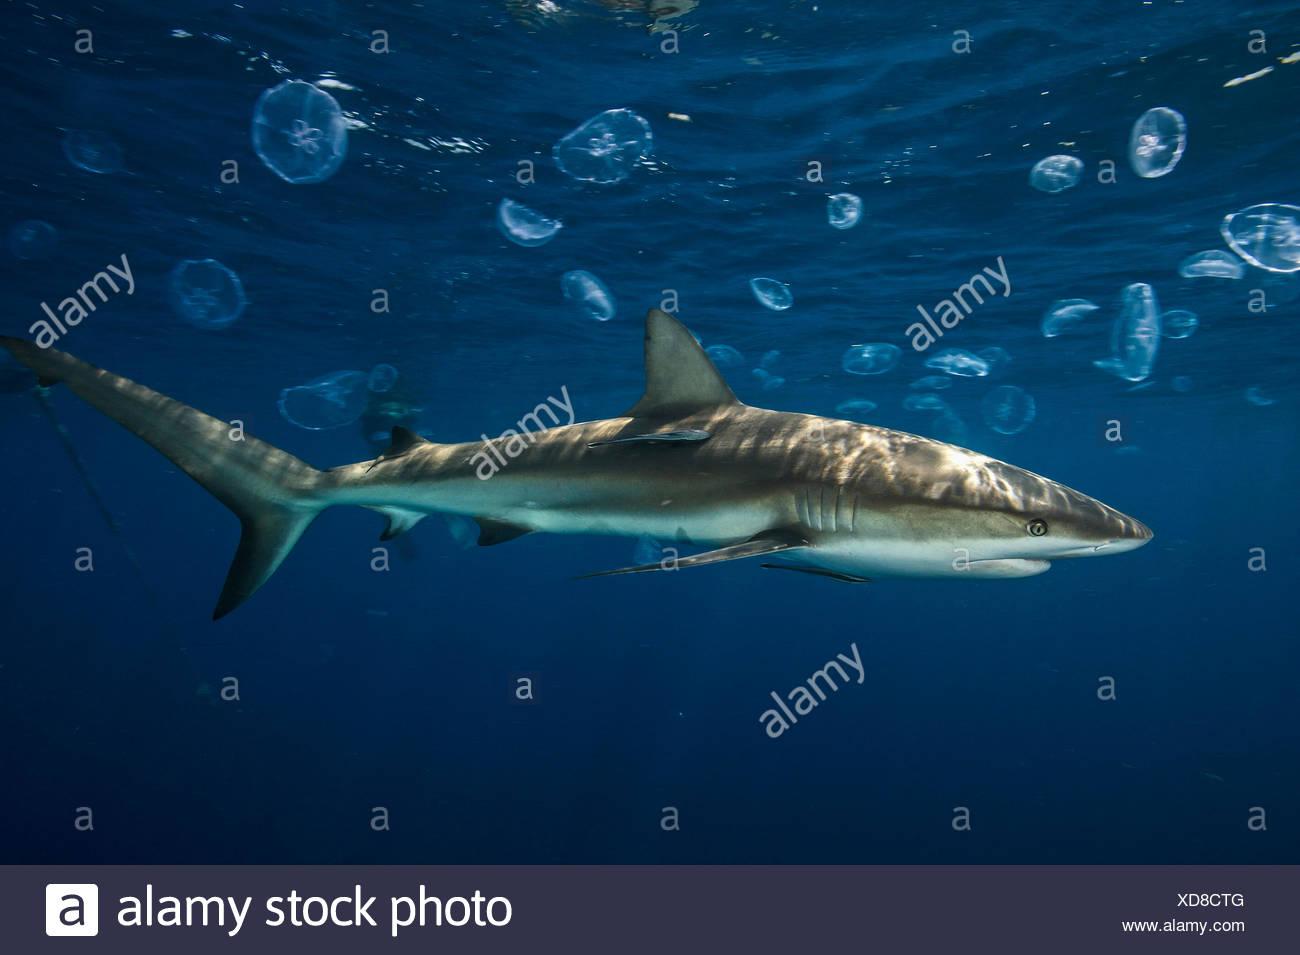 Caribbean Reef Shark Stock Photos & Caribbean Reef Shark